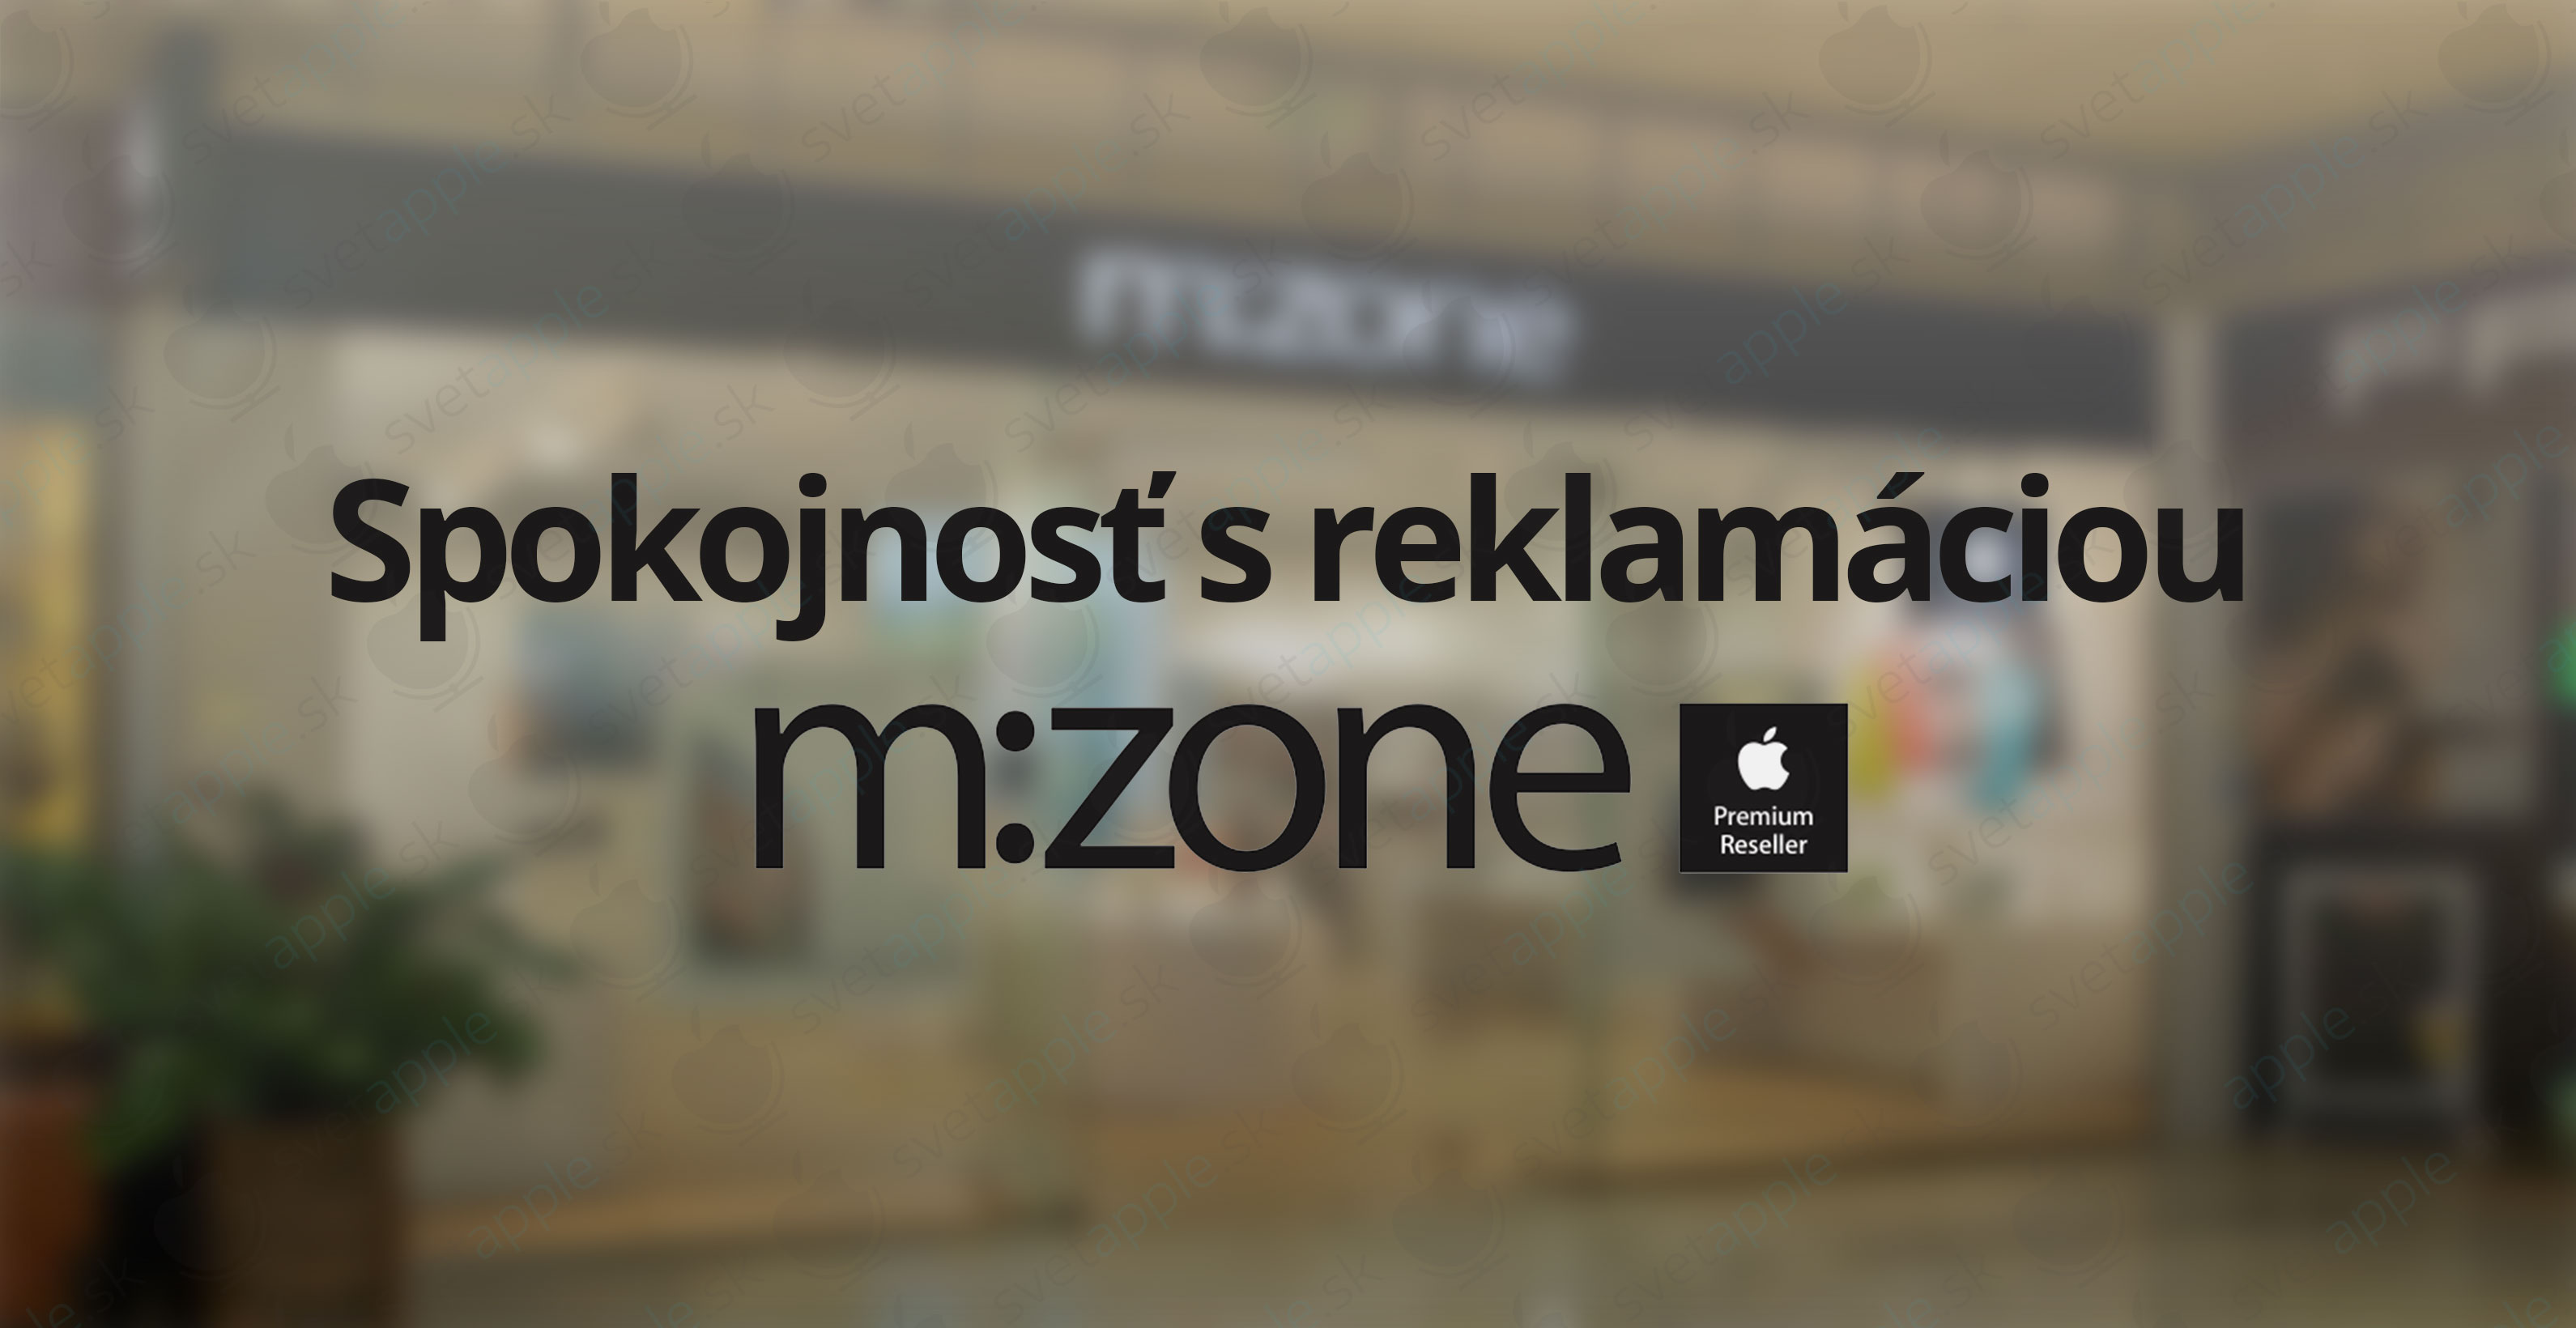 mzone-reklamacia---titulná-fotografia1---SvetApple